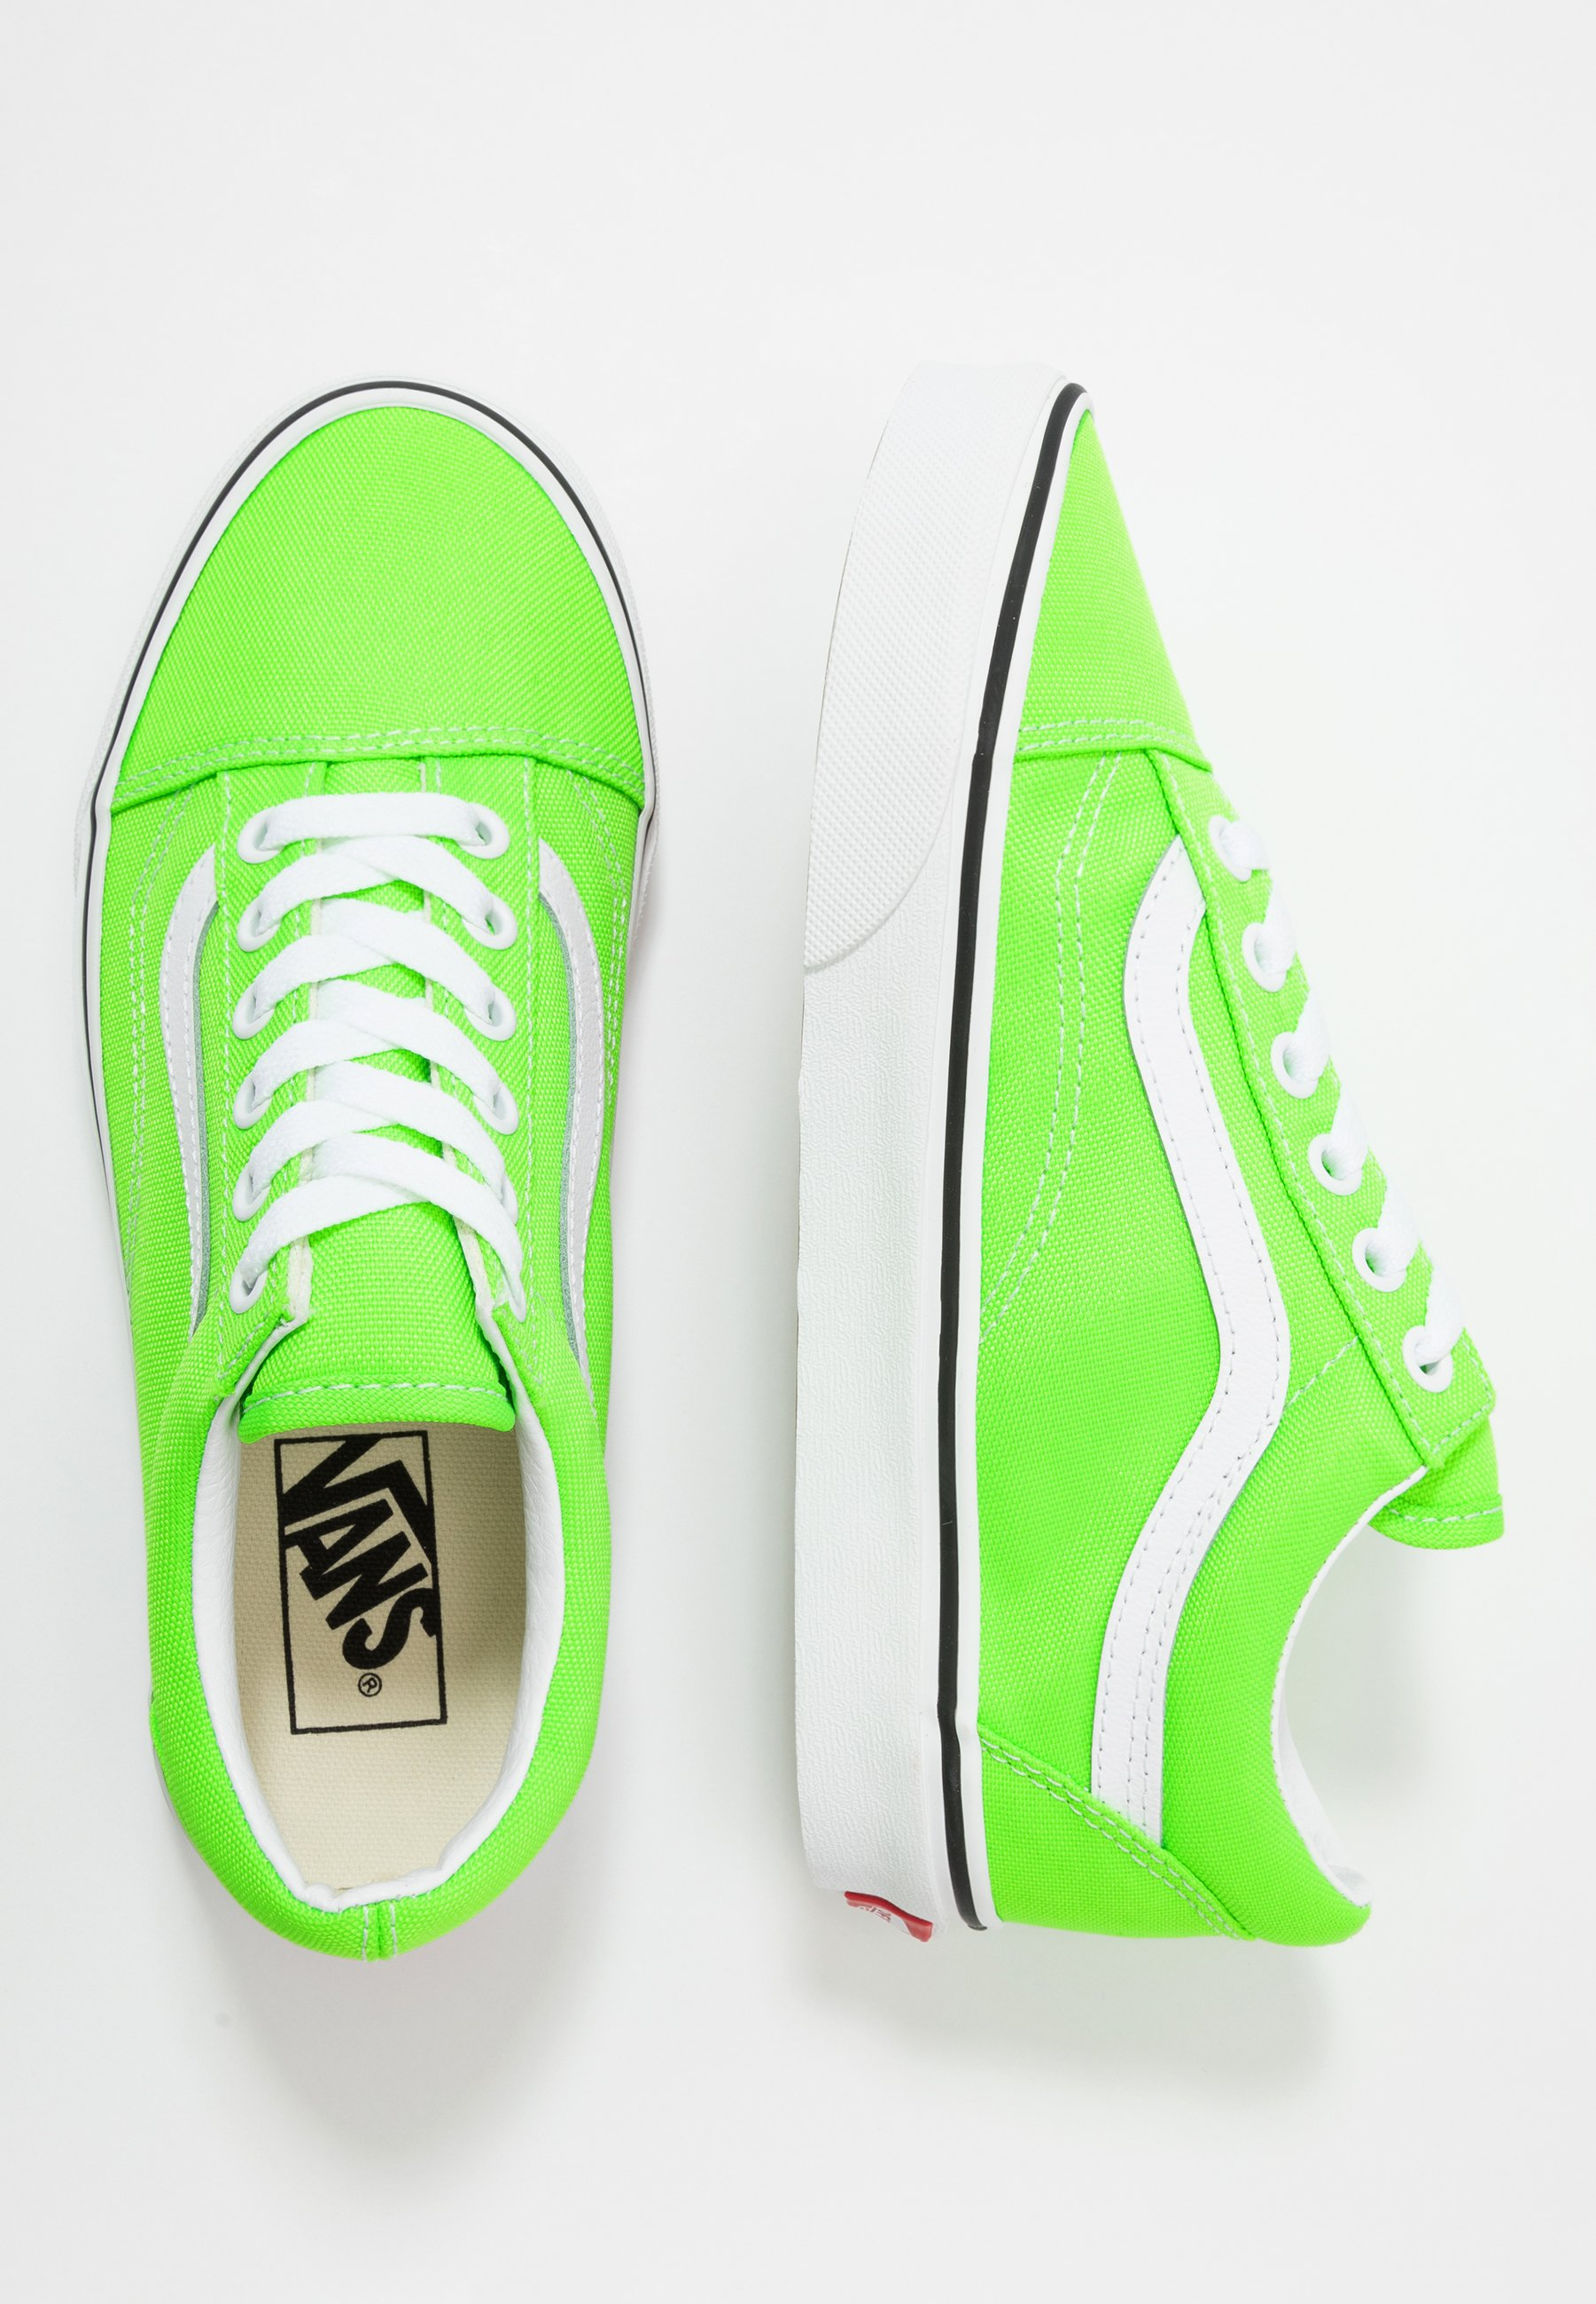 Vans OLD SKOOL UNISEX - Sneakers basse - neon green gecko/true white/verde  fluo - Zalando.it